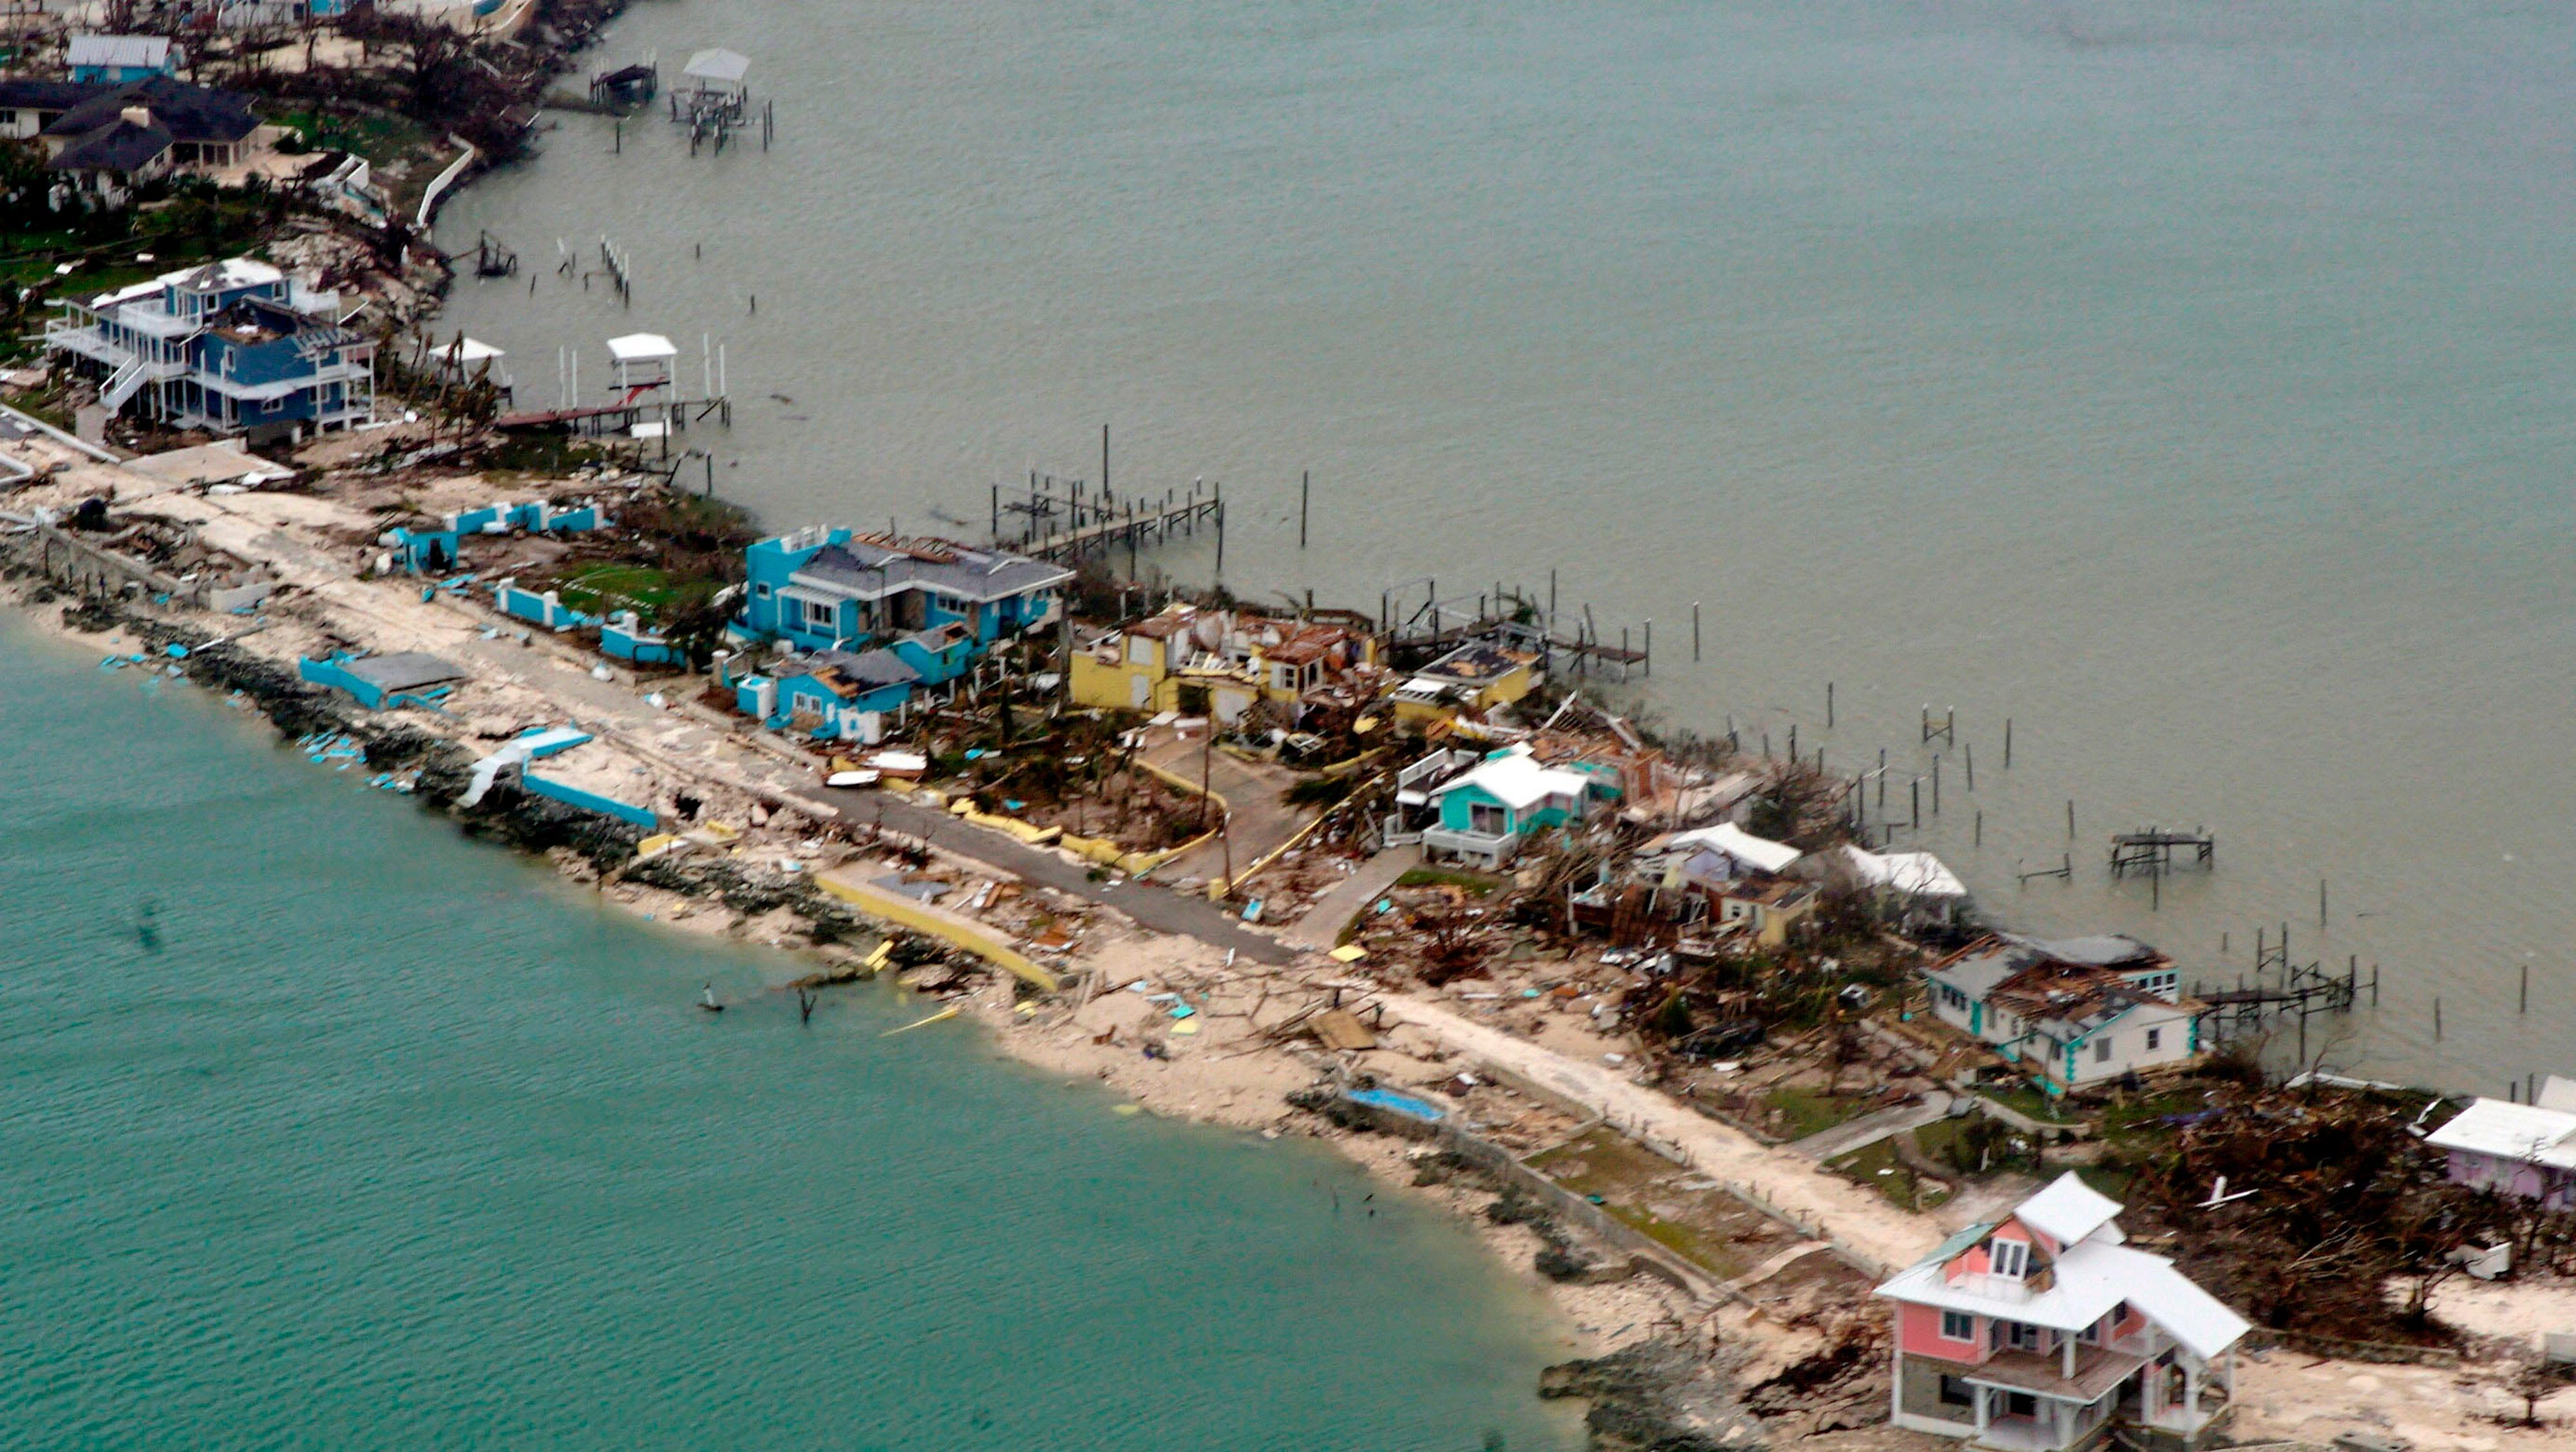 'Total devastation. Apocalyptic': Massive rescue effort in Bahamas; Hurricane Dorian leaves 20 dead